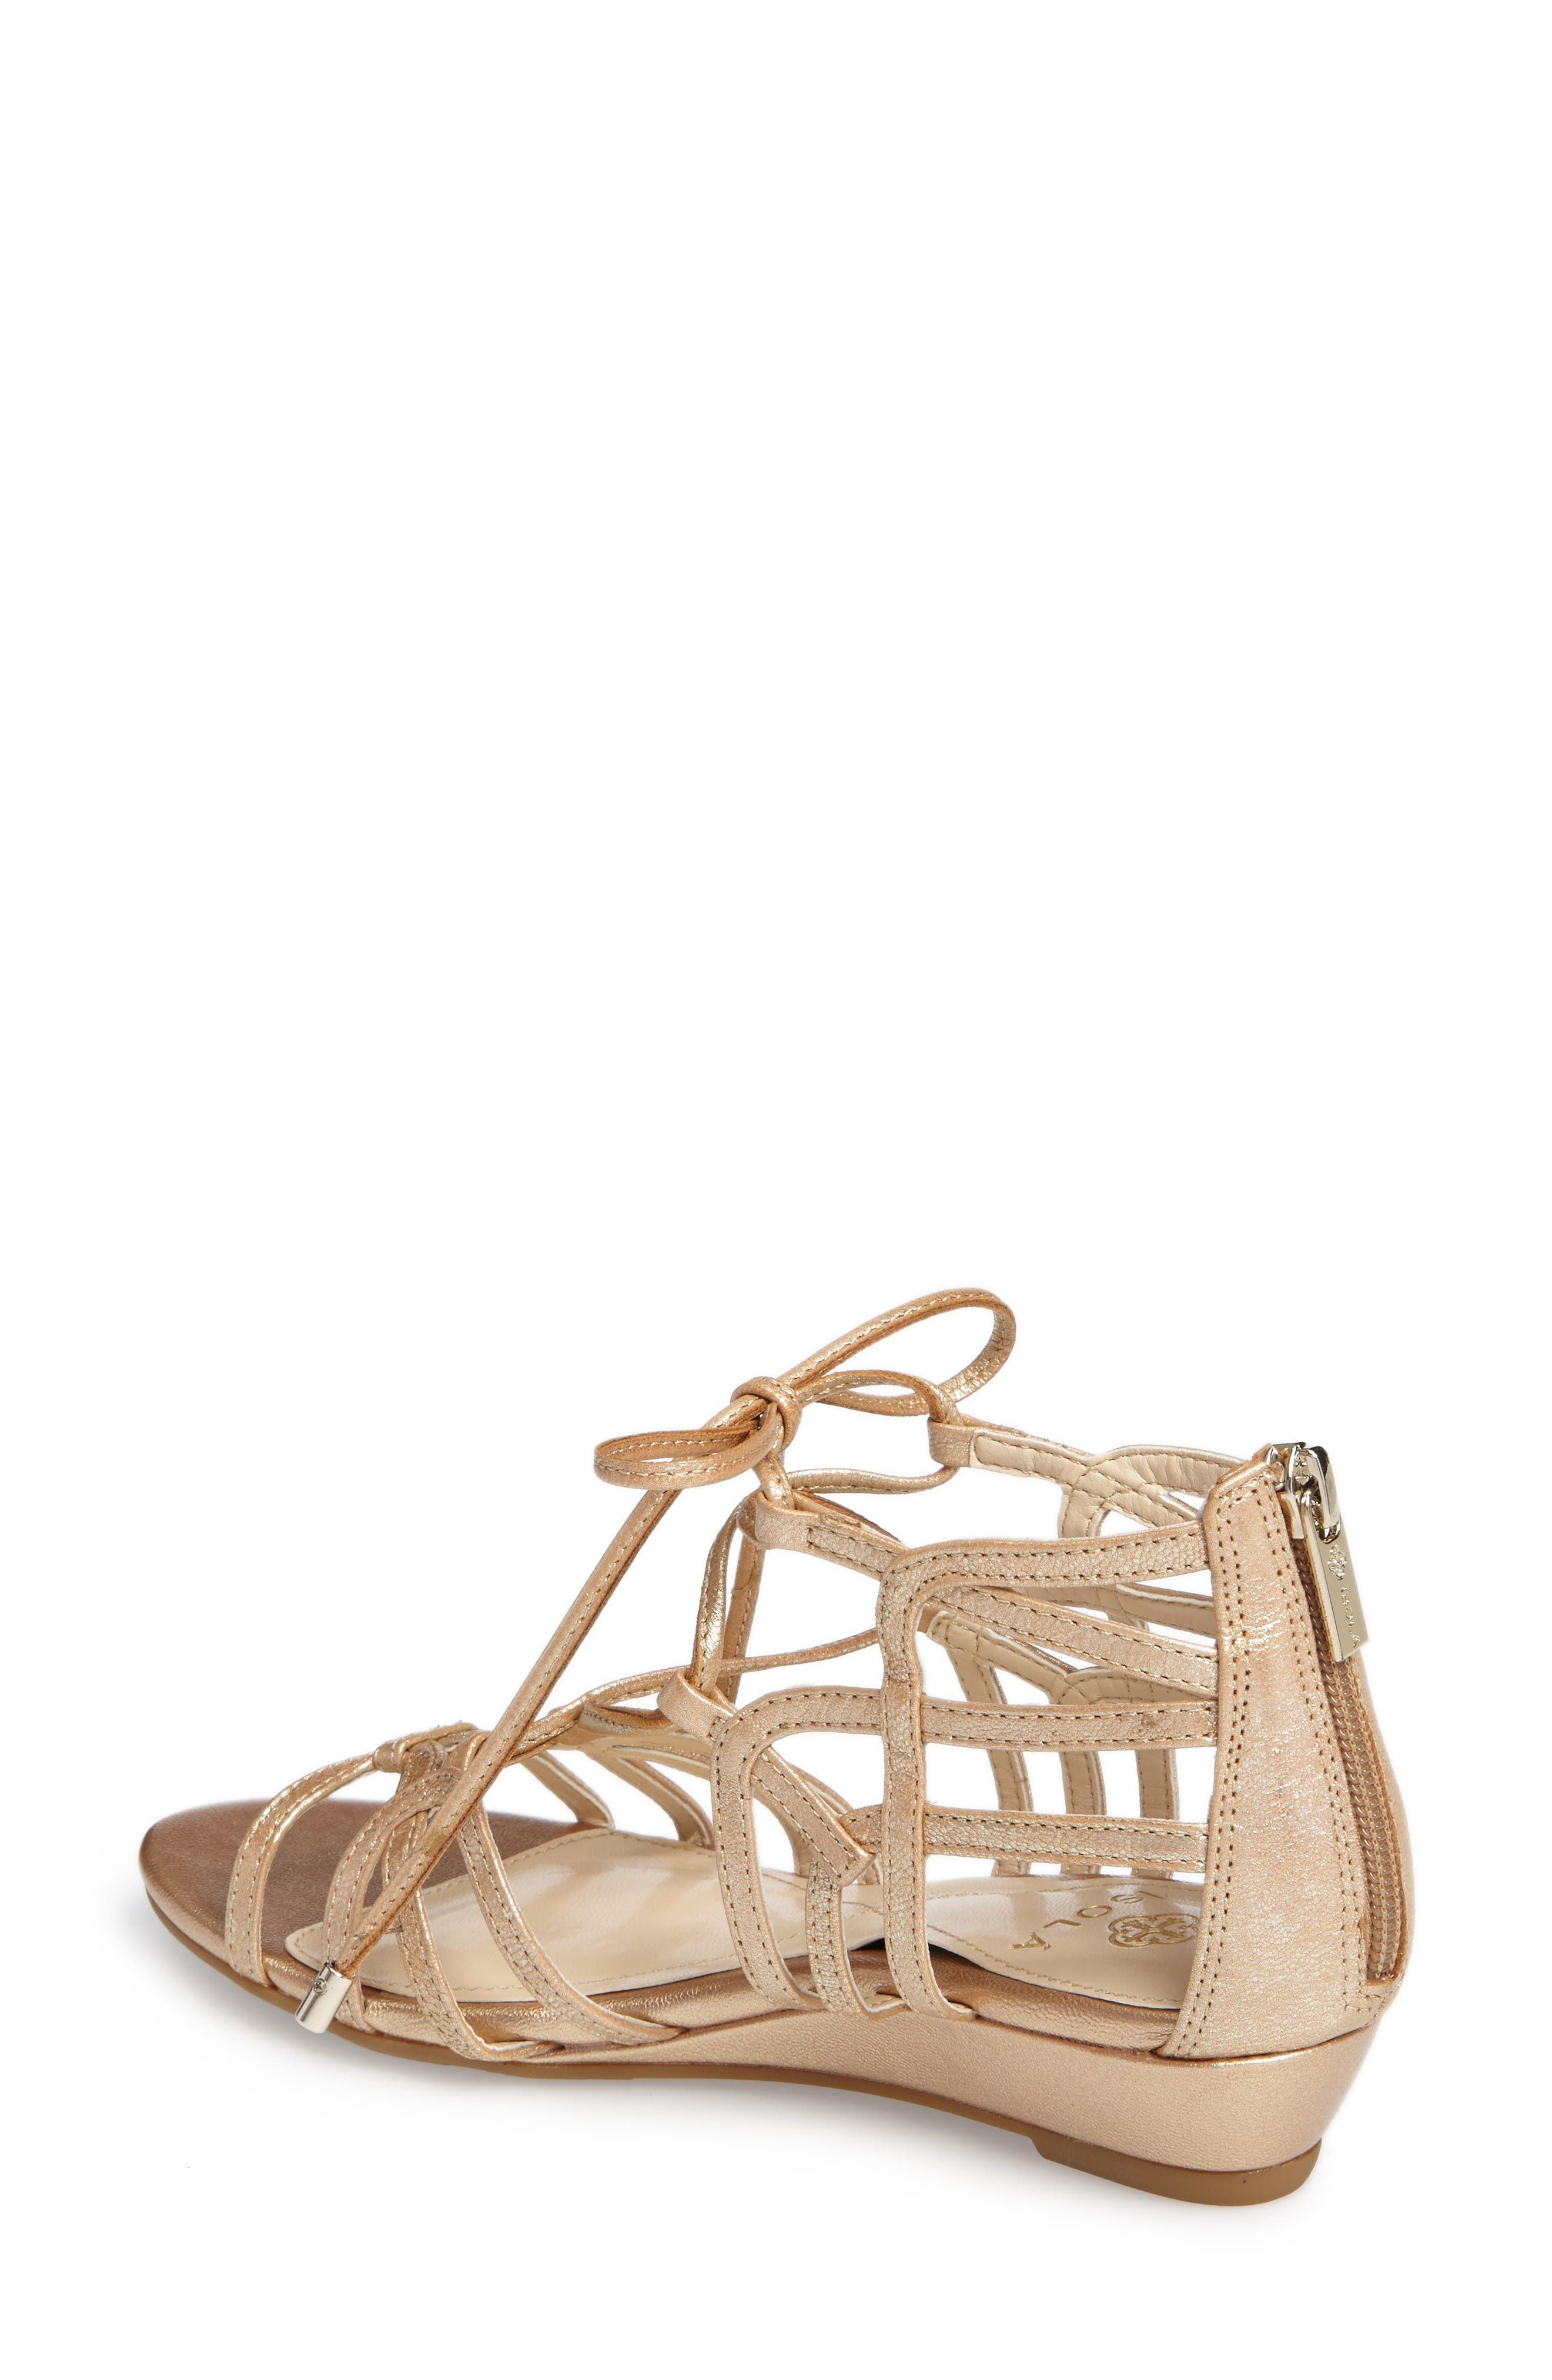 Elisia Lace-Up Sandal,                             Alternate thumbnail 2, color,                             Gold Leather